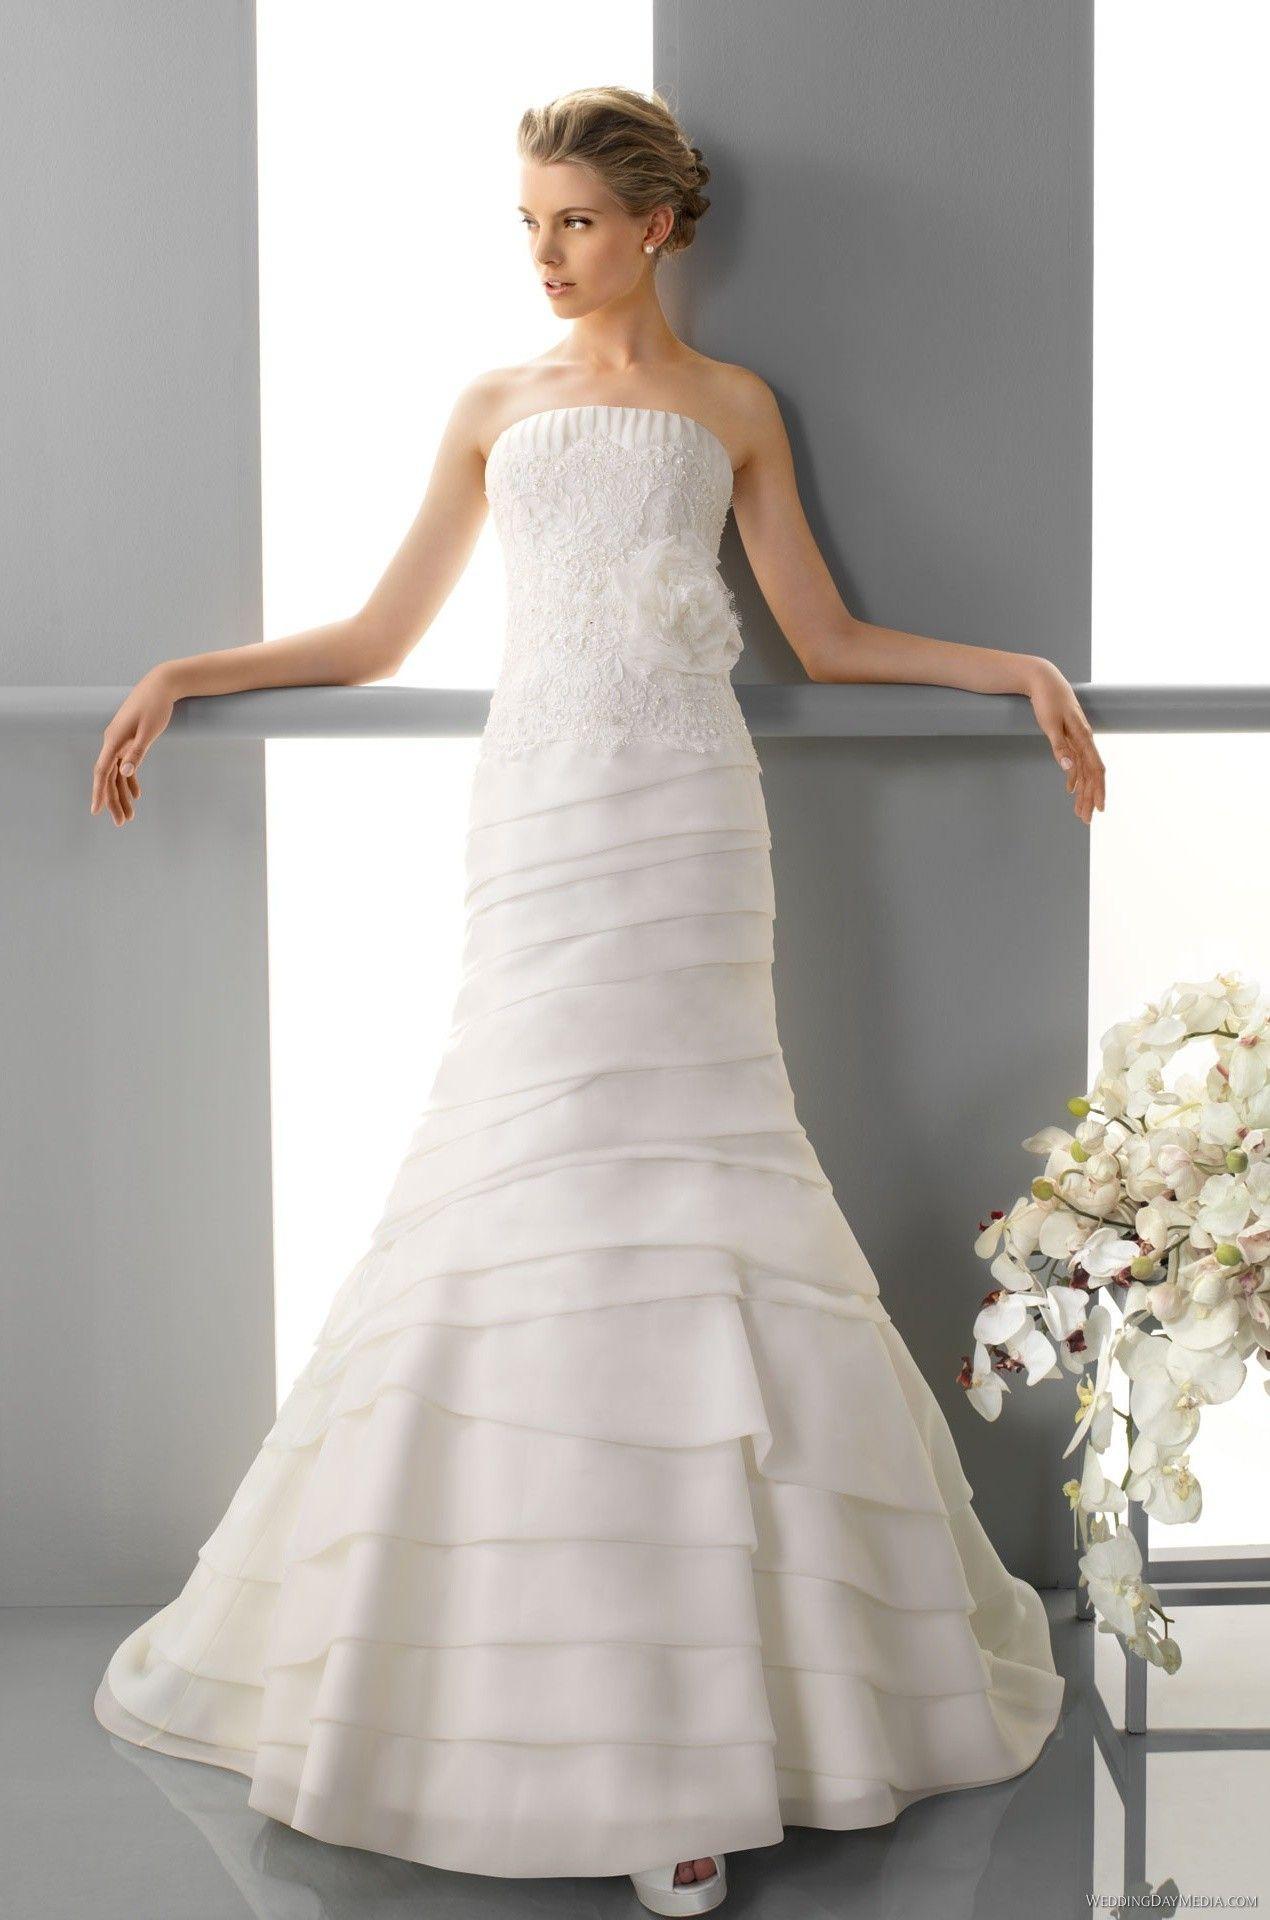 Alma Novia - 129 Feria - 2013 $302.99 #alma #novia #bridalgown #feria #bridal #wedding #mywedding #weddingdress